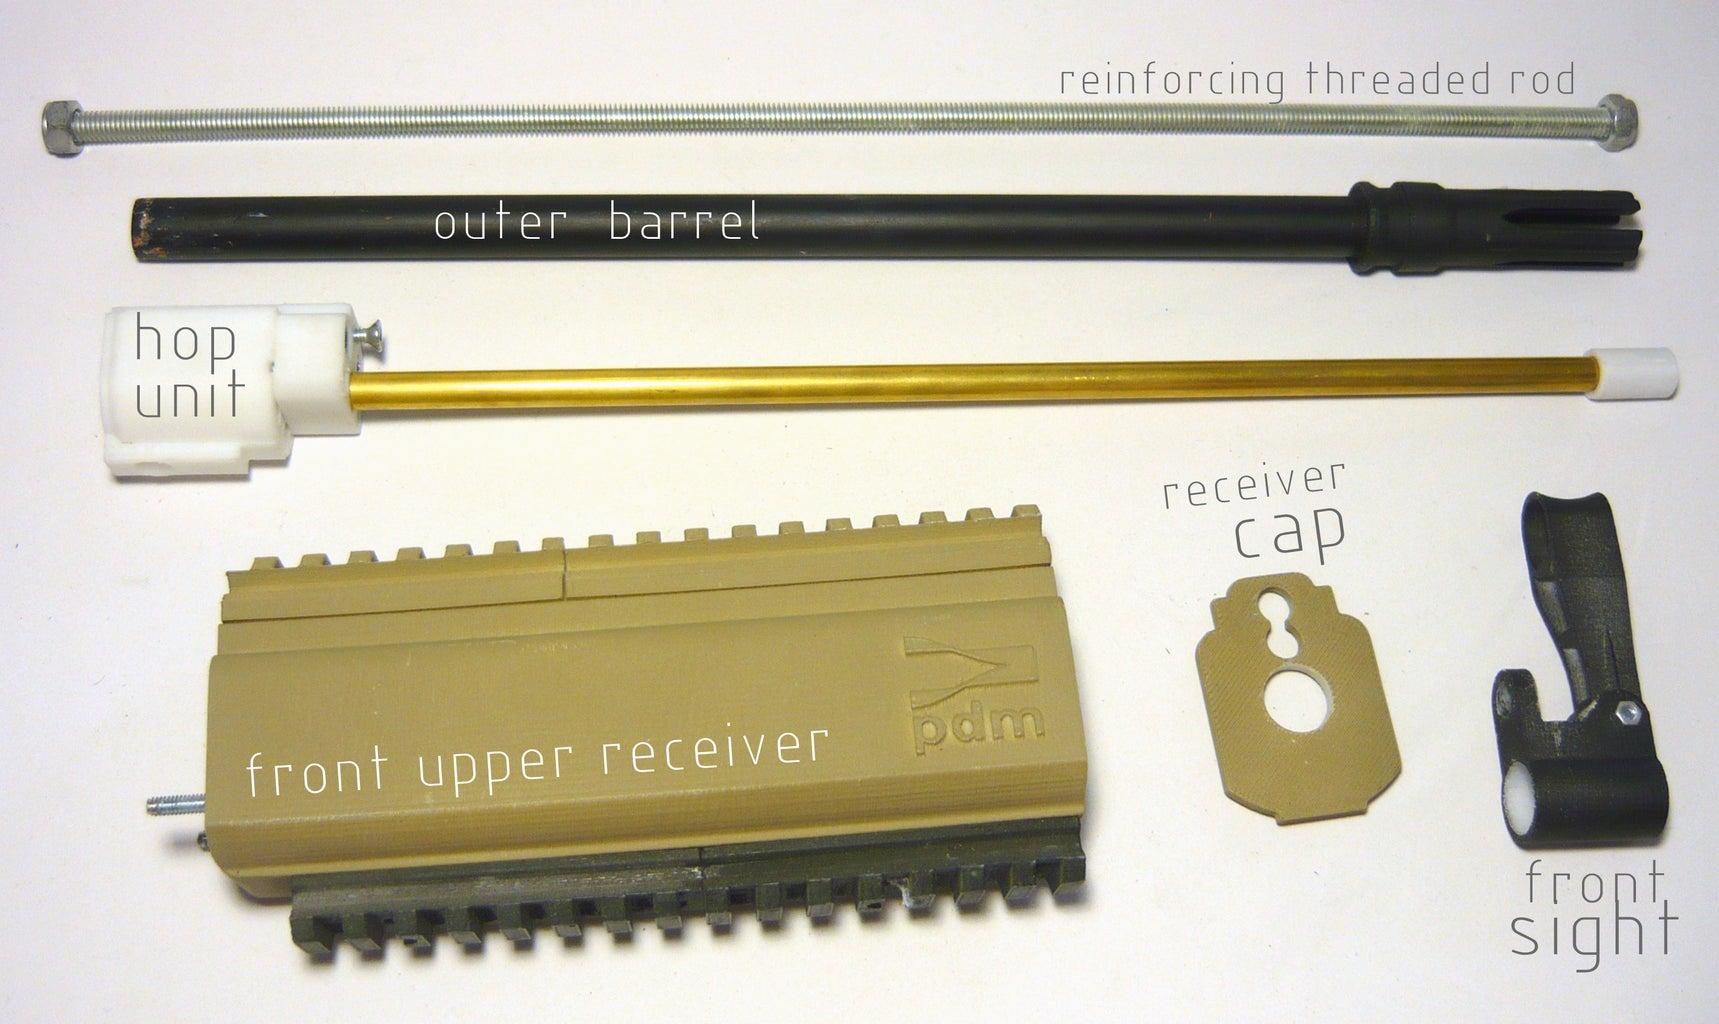 FRONT UPPER RECEIVER